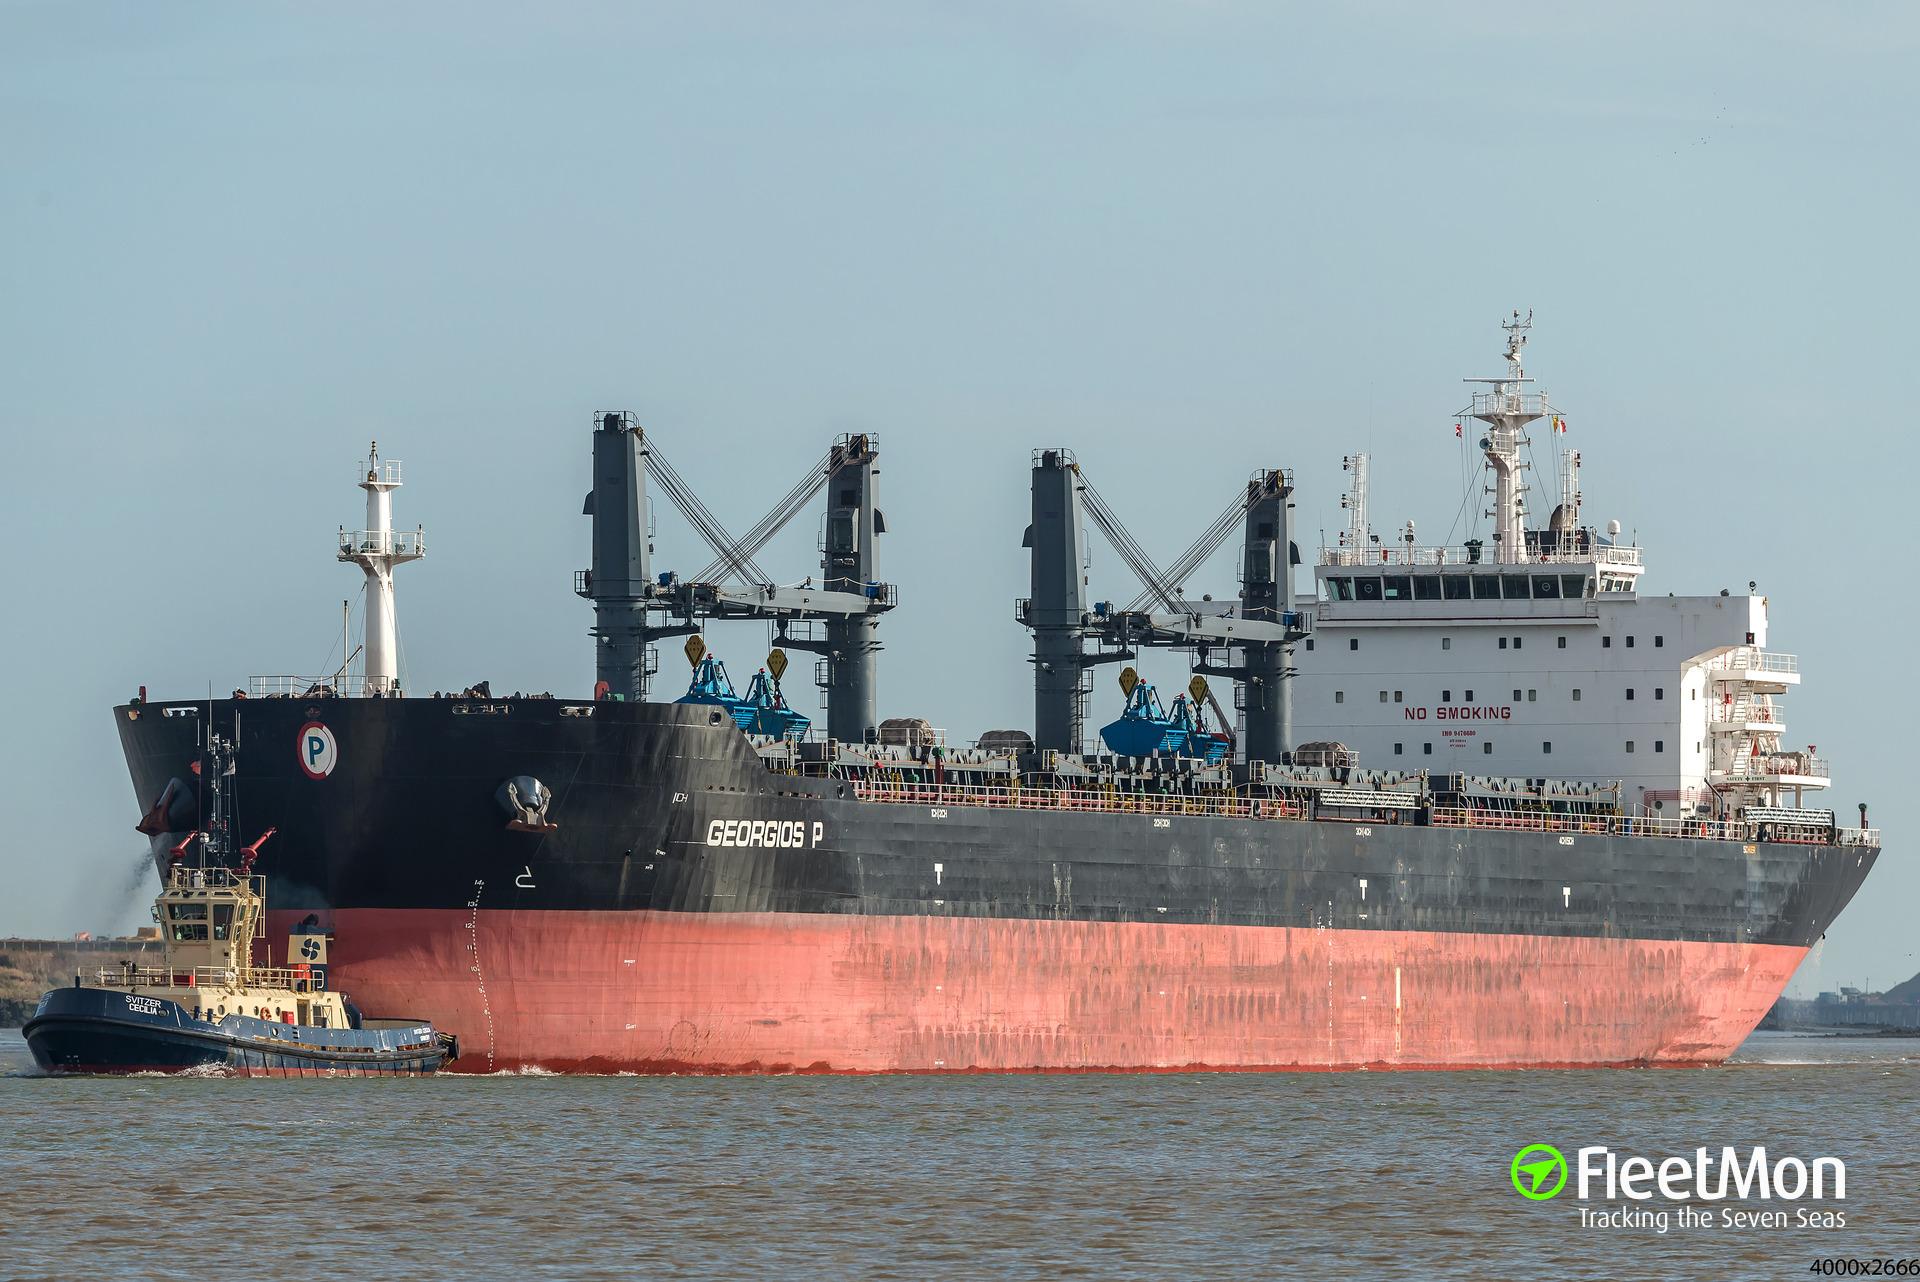 Bulk carrier fire and mysterious behavior, Black sea